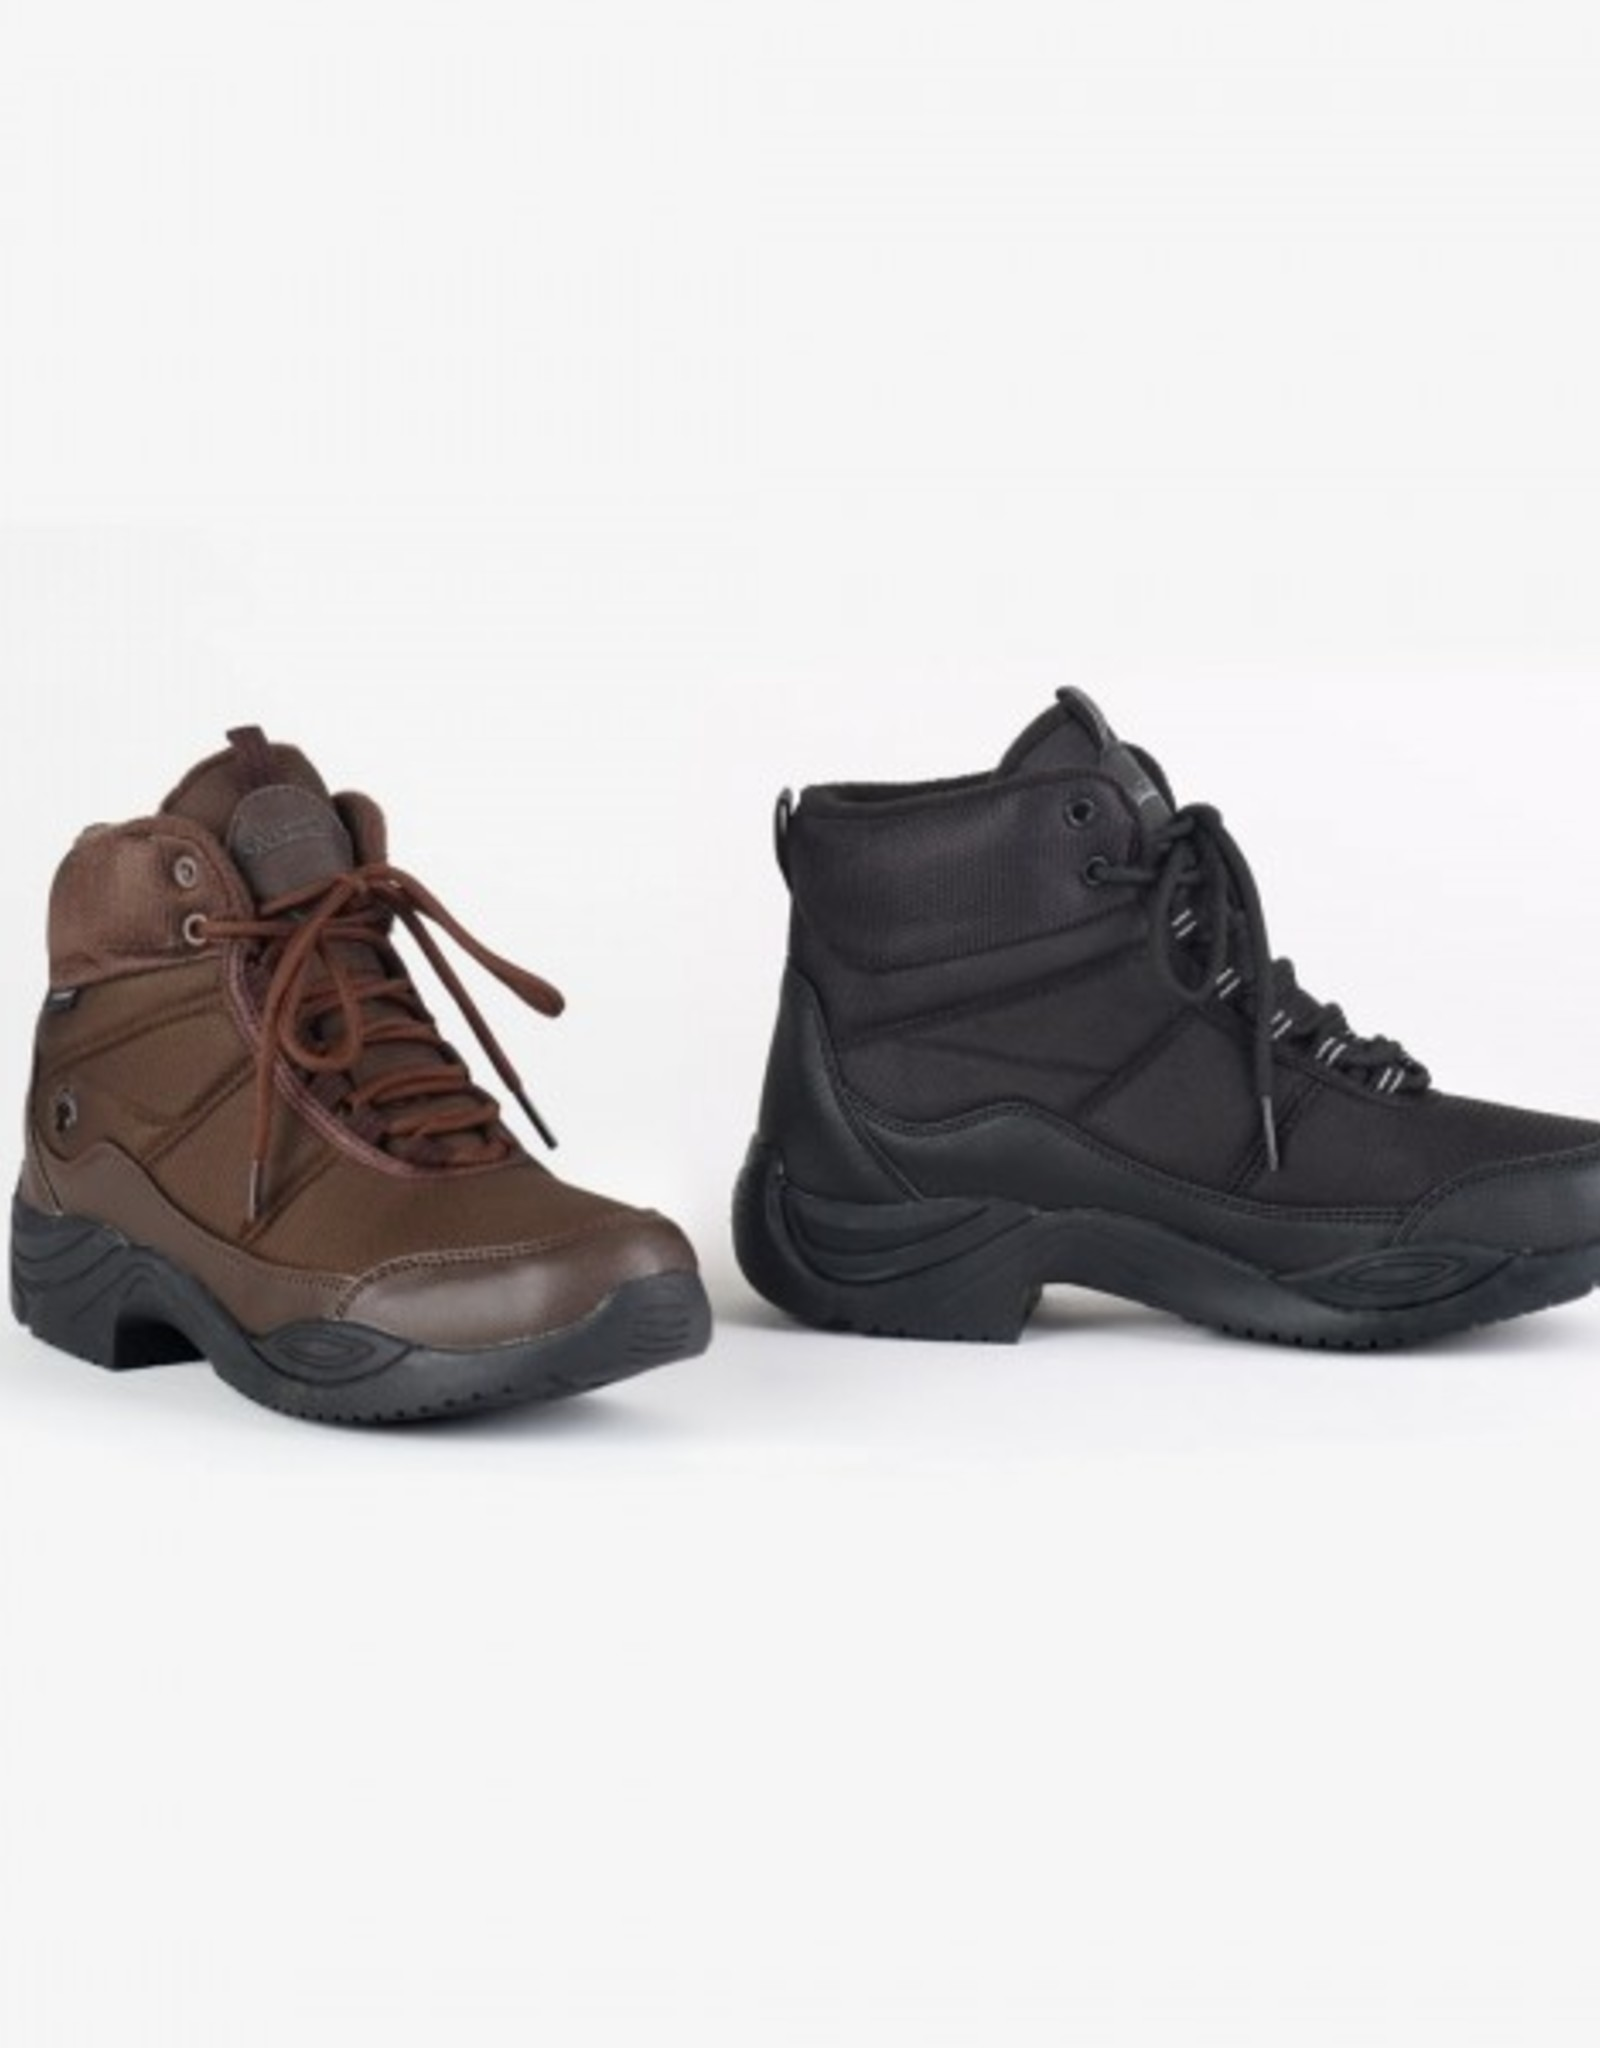 Ovation Ladies' Heel Down Riding Sneaker